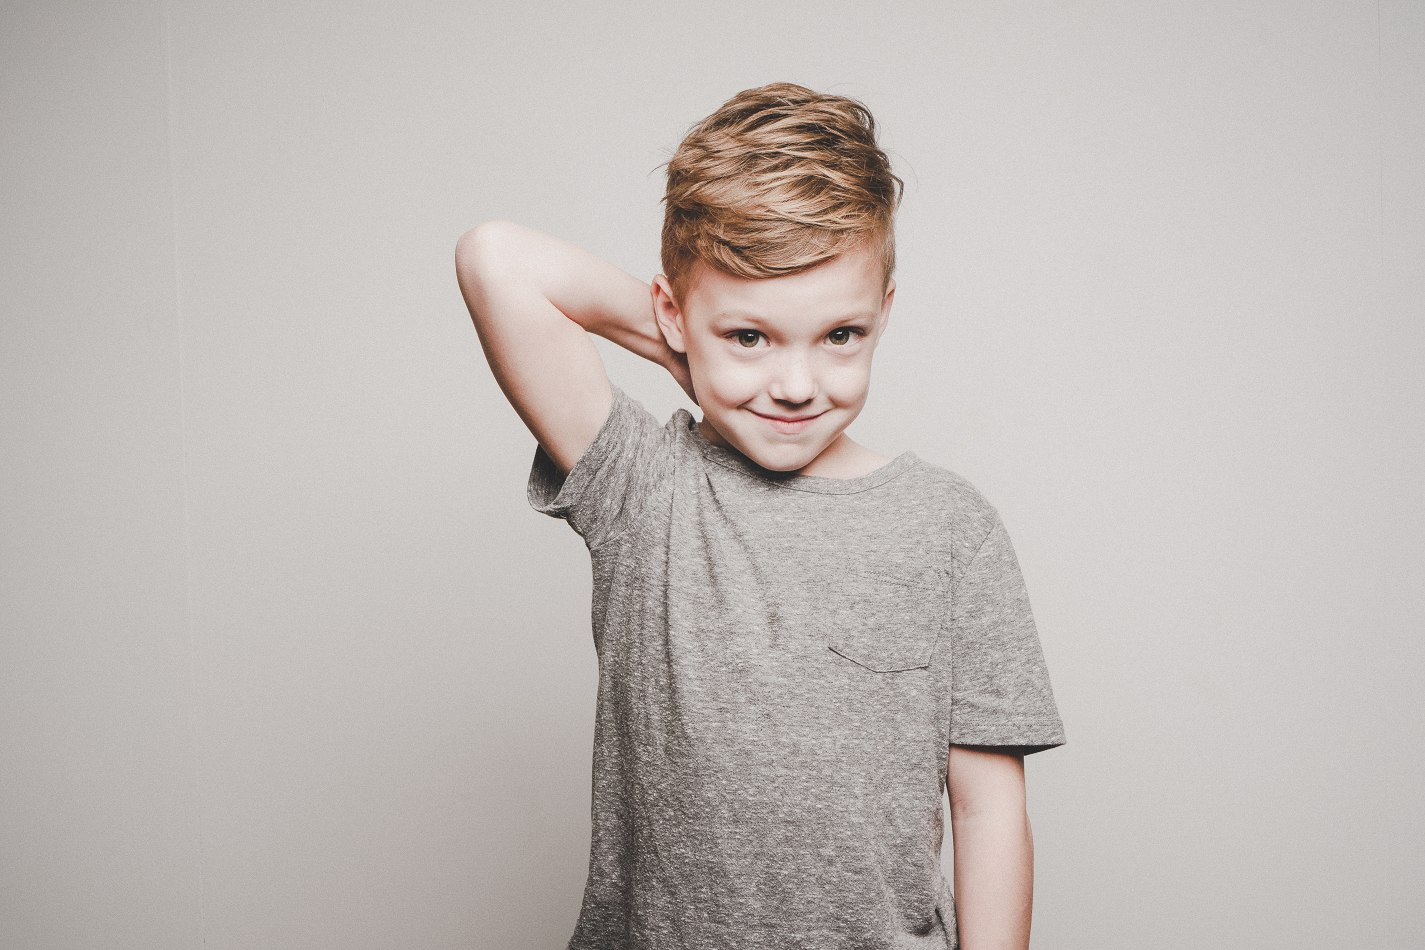 Slayton Kirkendall | AMAX | 7 | Son of Lindsey K